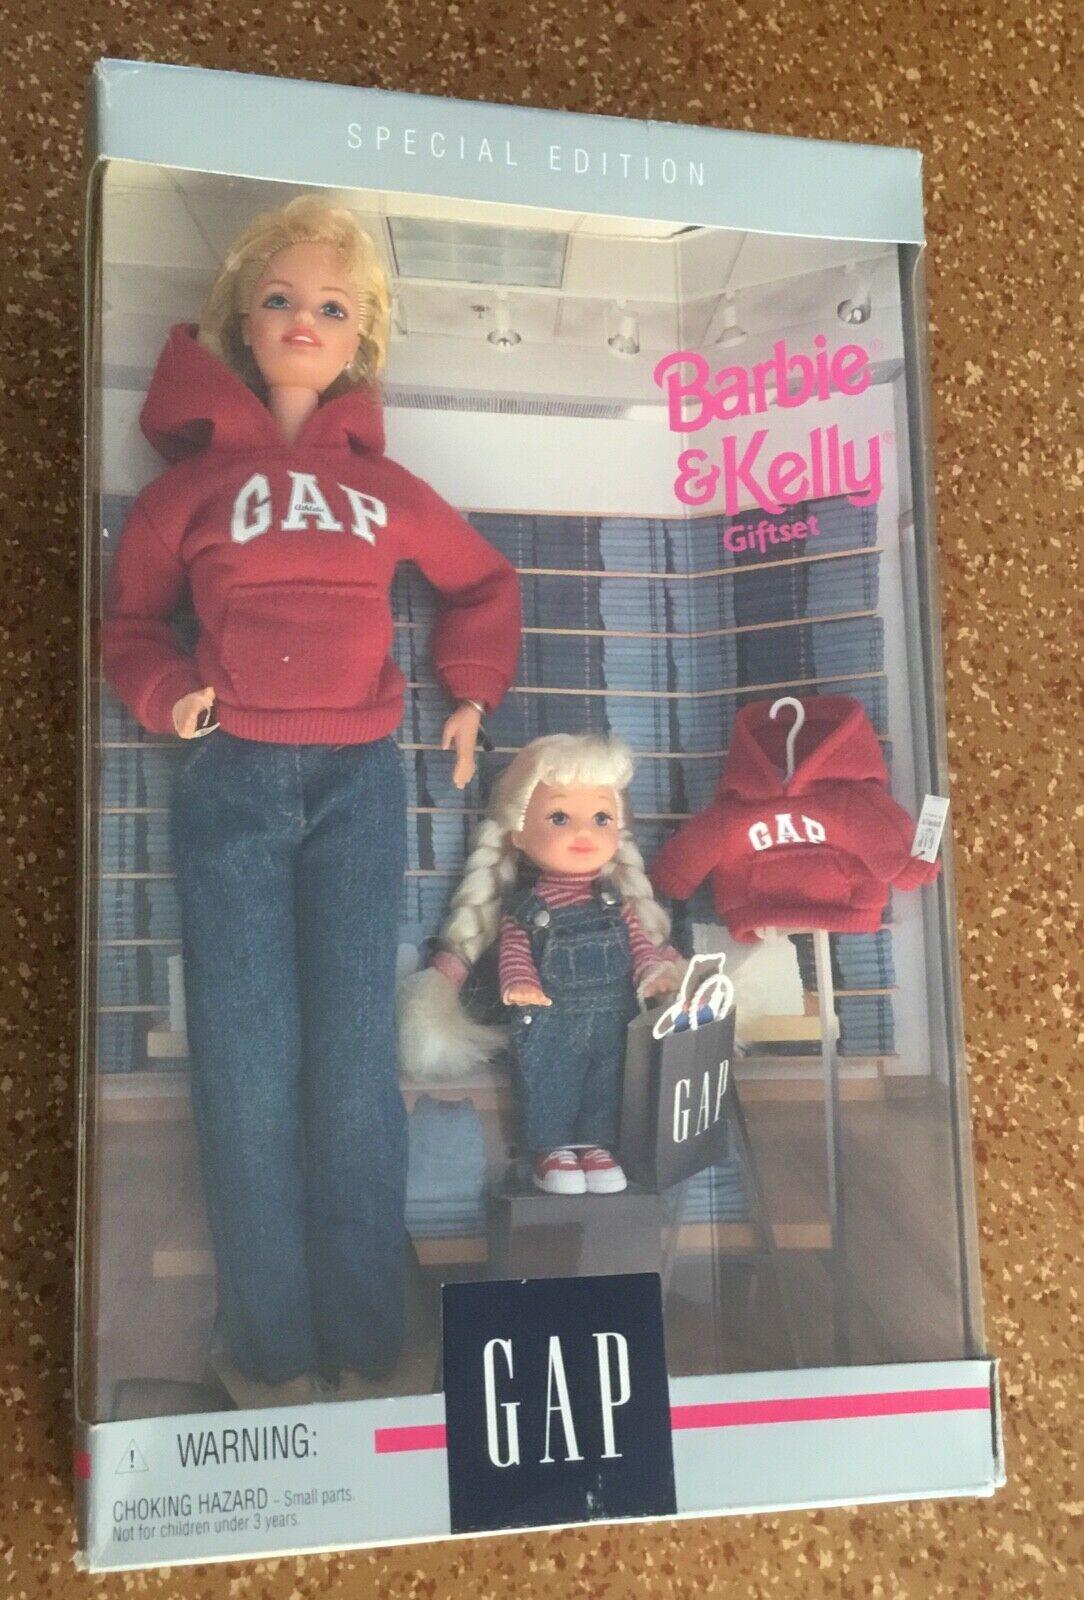 1997 Special edition GAP Barbie & Kelly giftset doll NRFB